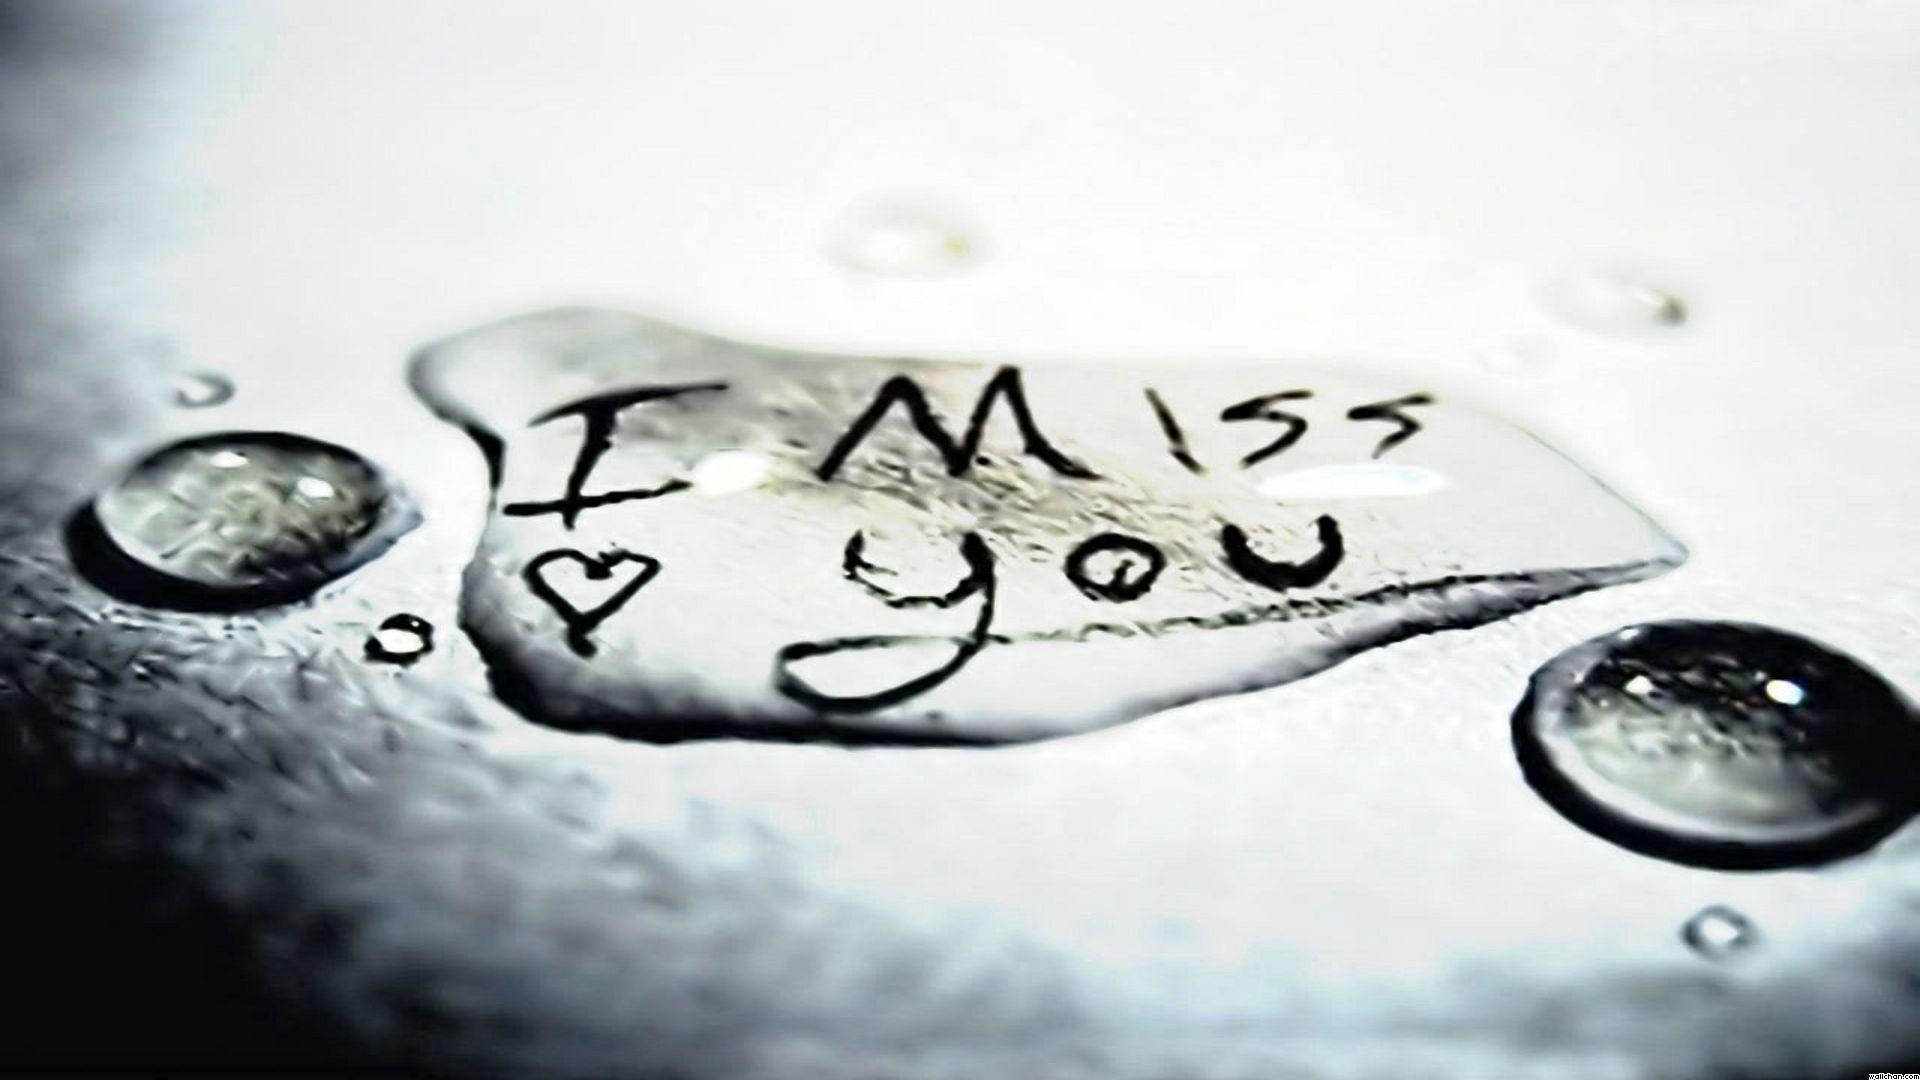 I Miss U My Love Wallpapers - Wallpaper Cave